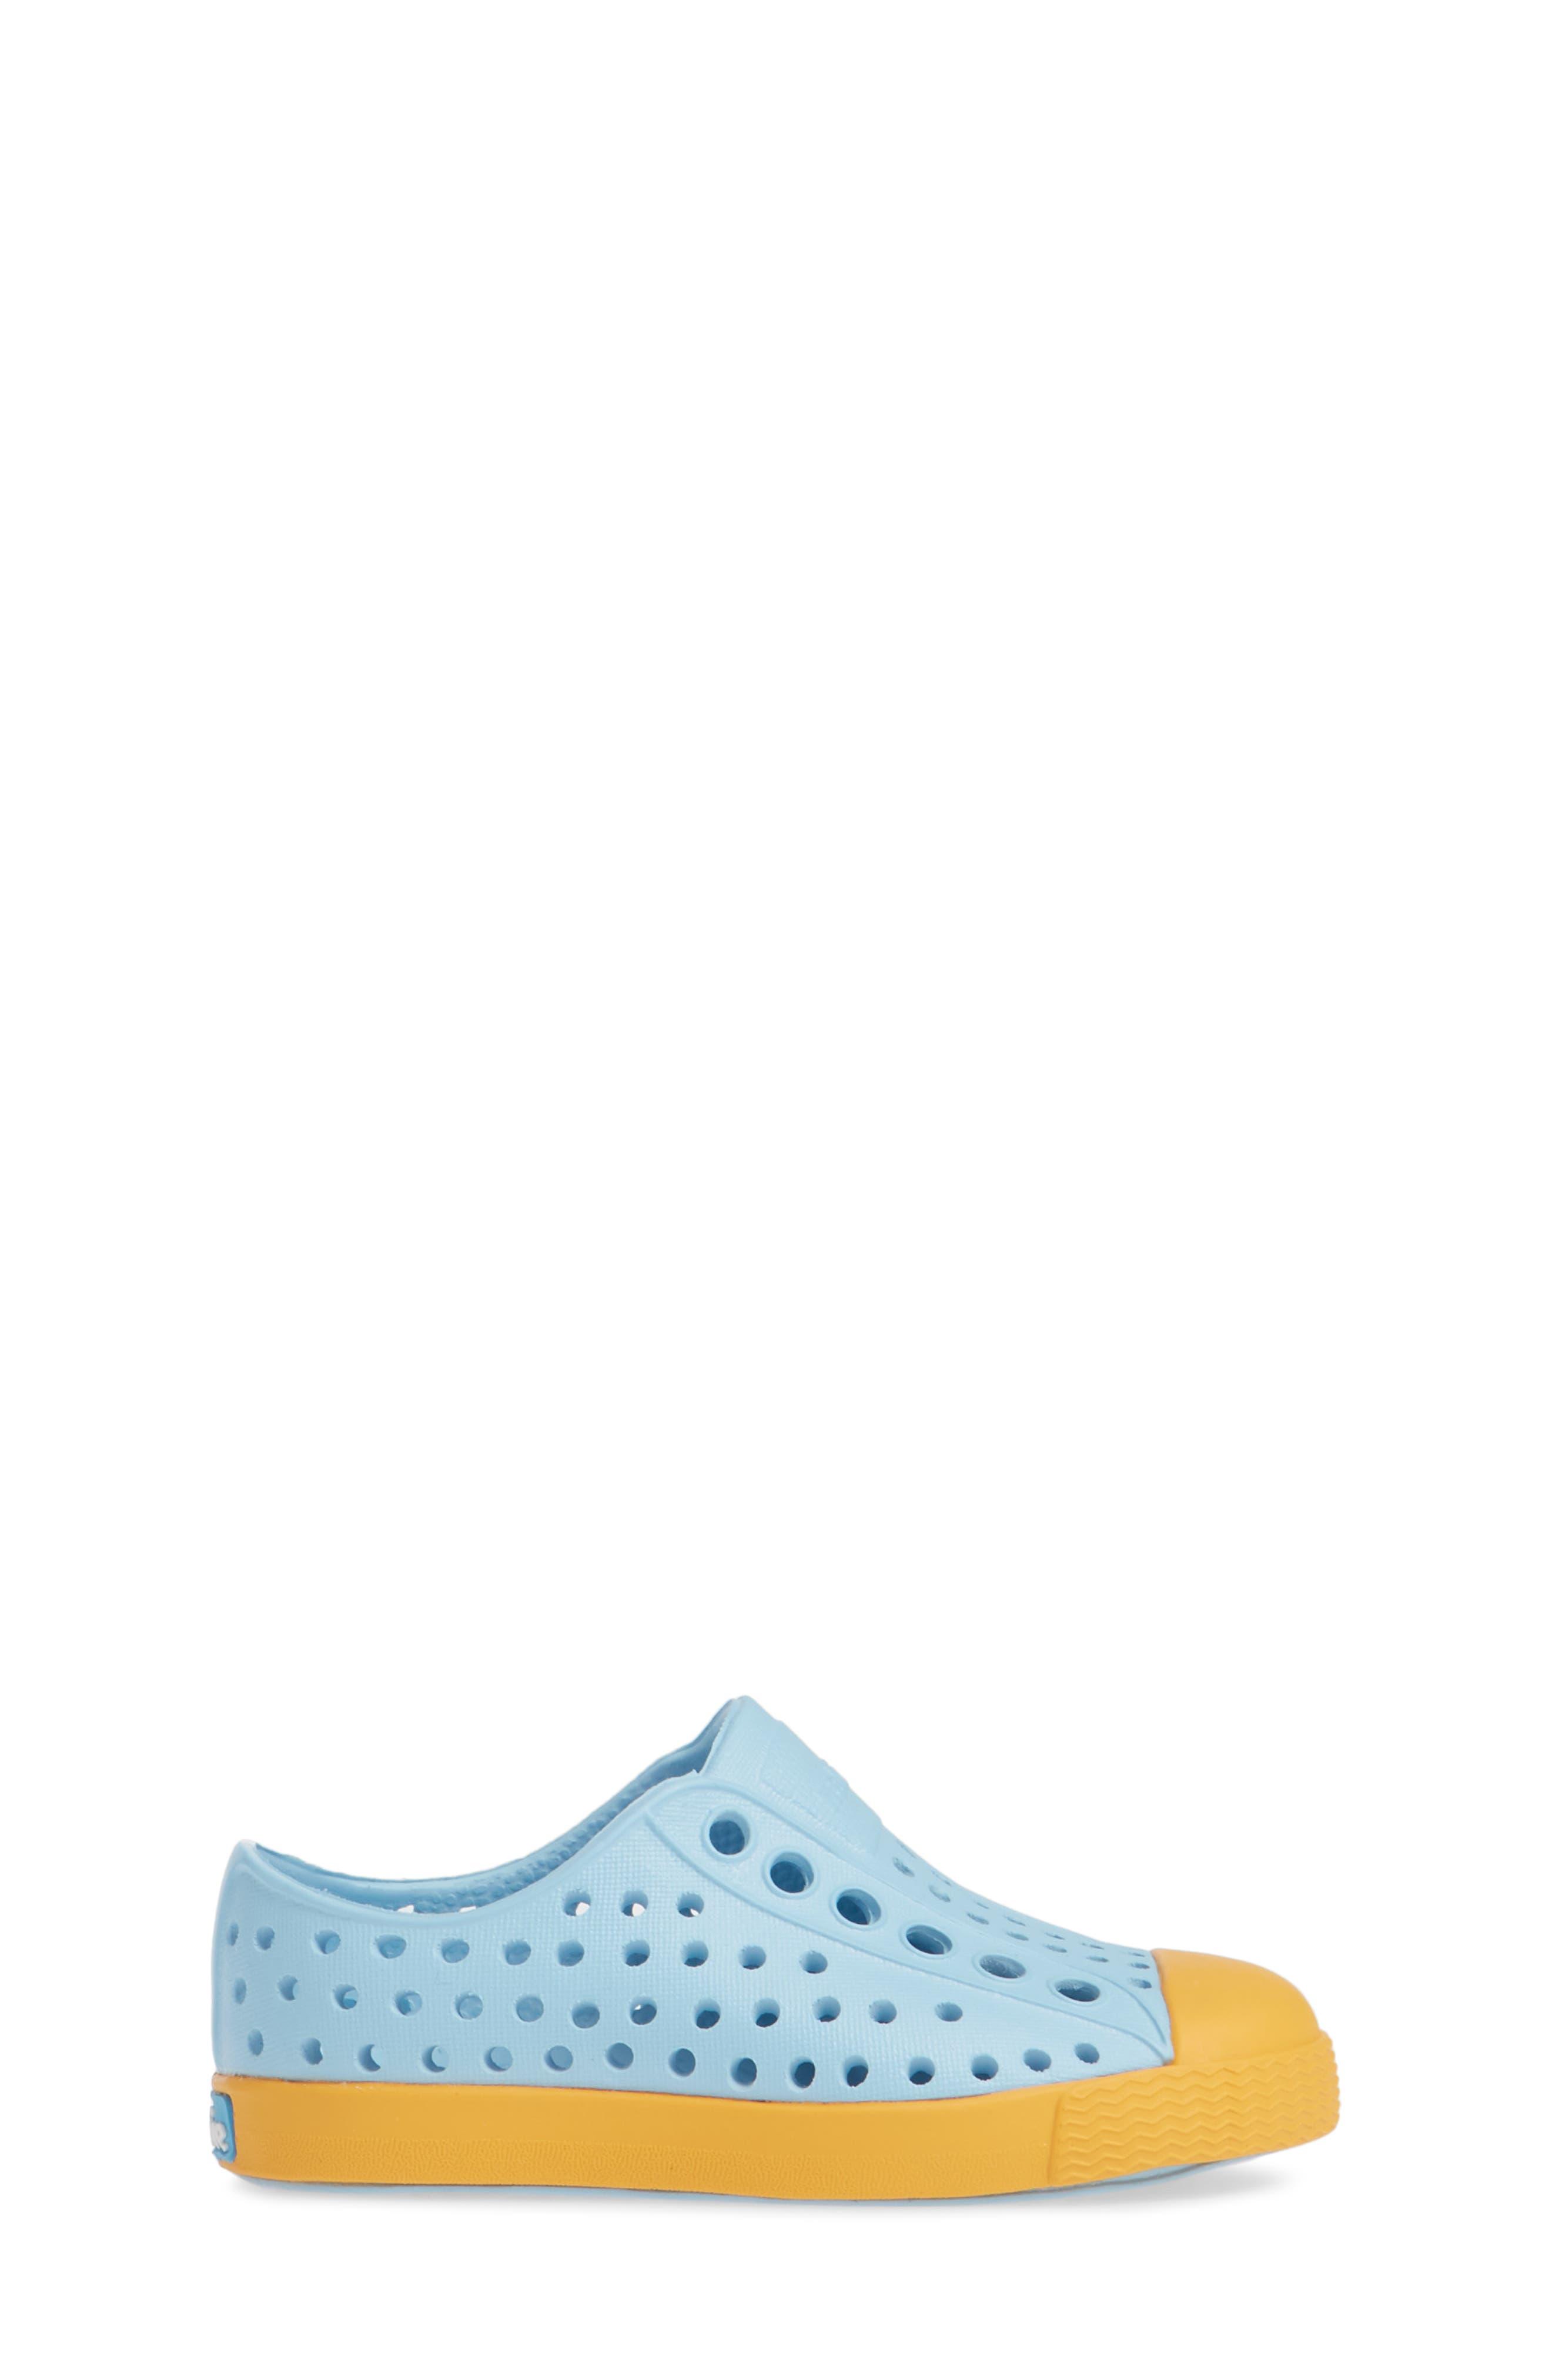 'Jefferson' Water Friendly Slip-On Sneaker,                             Alternate thumbnail 129, color,